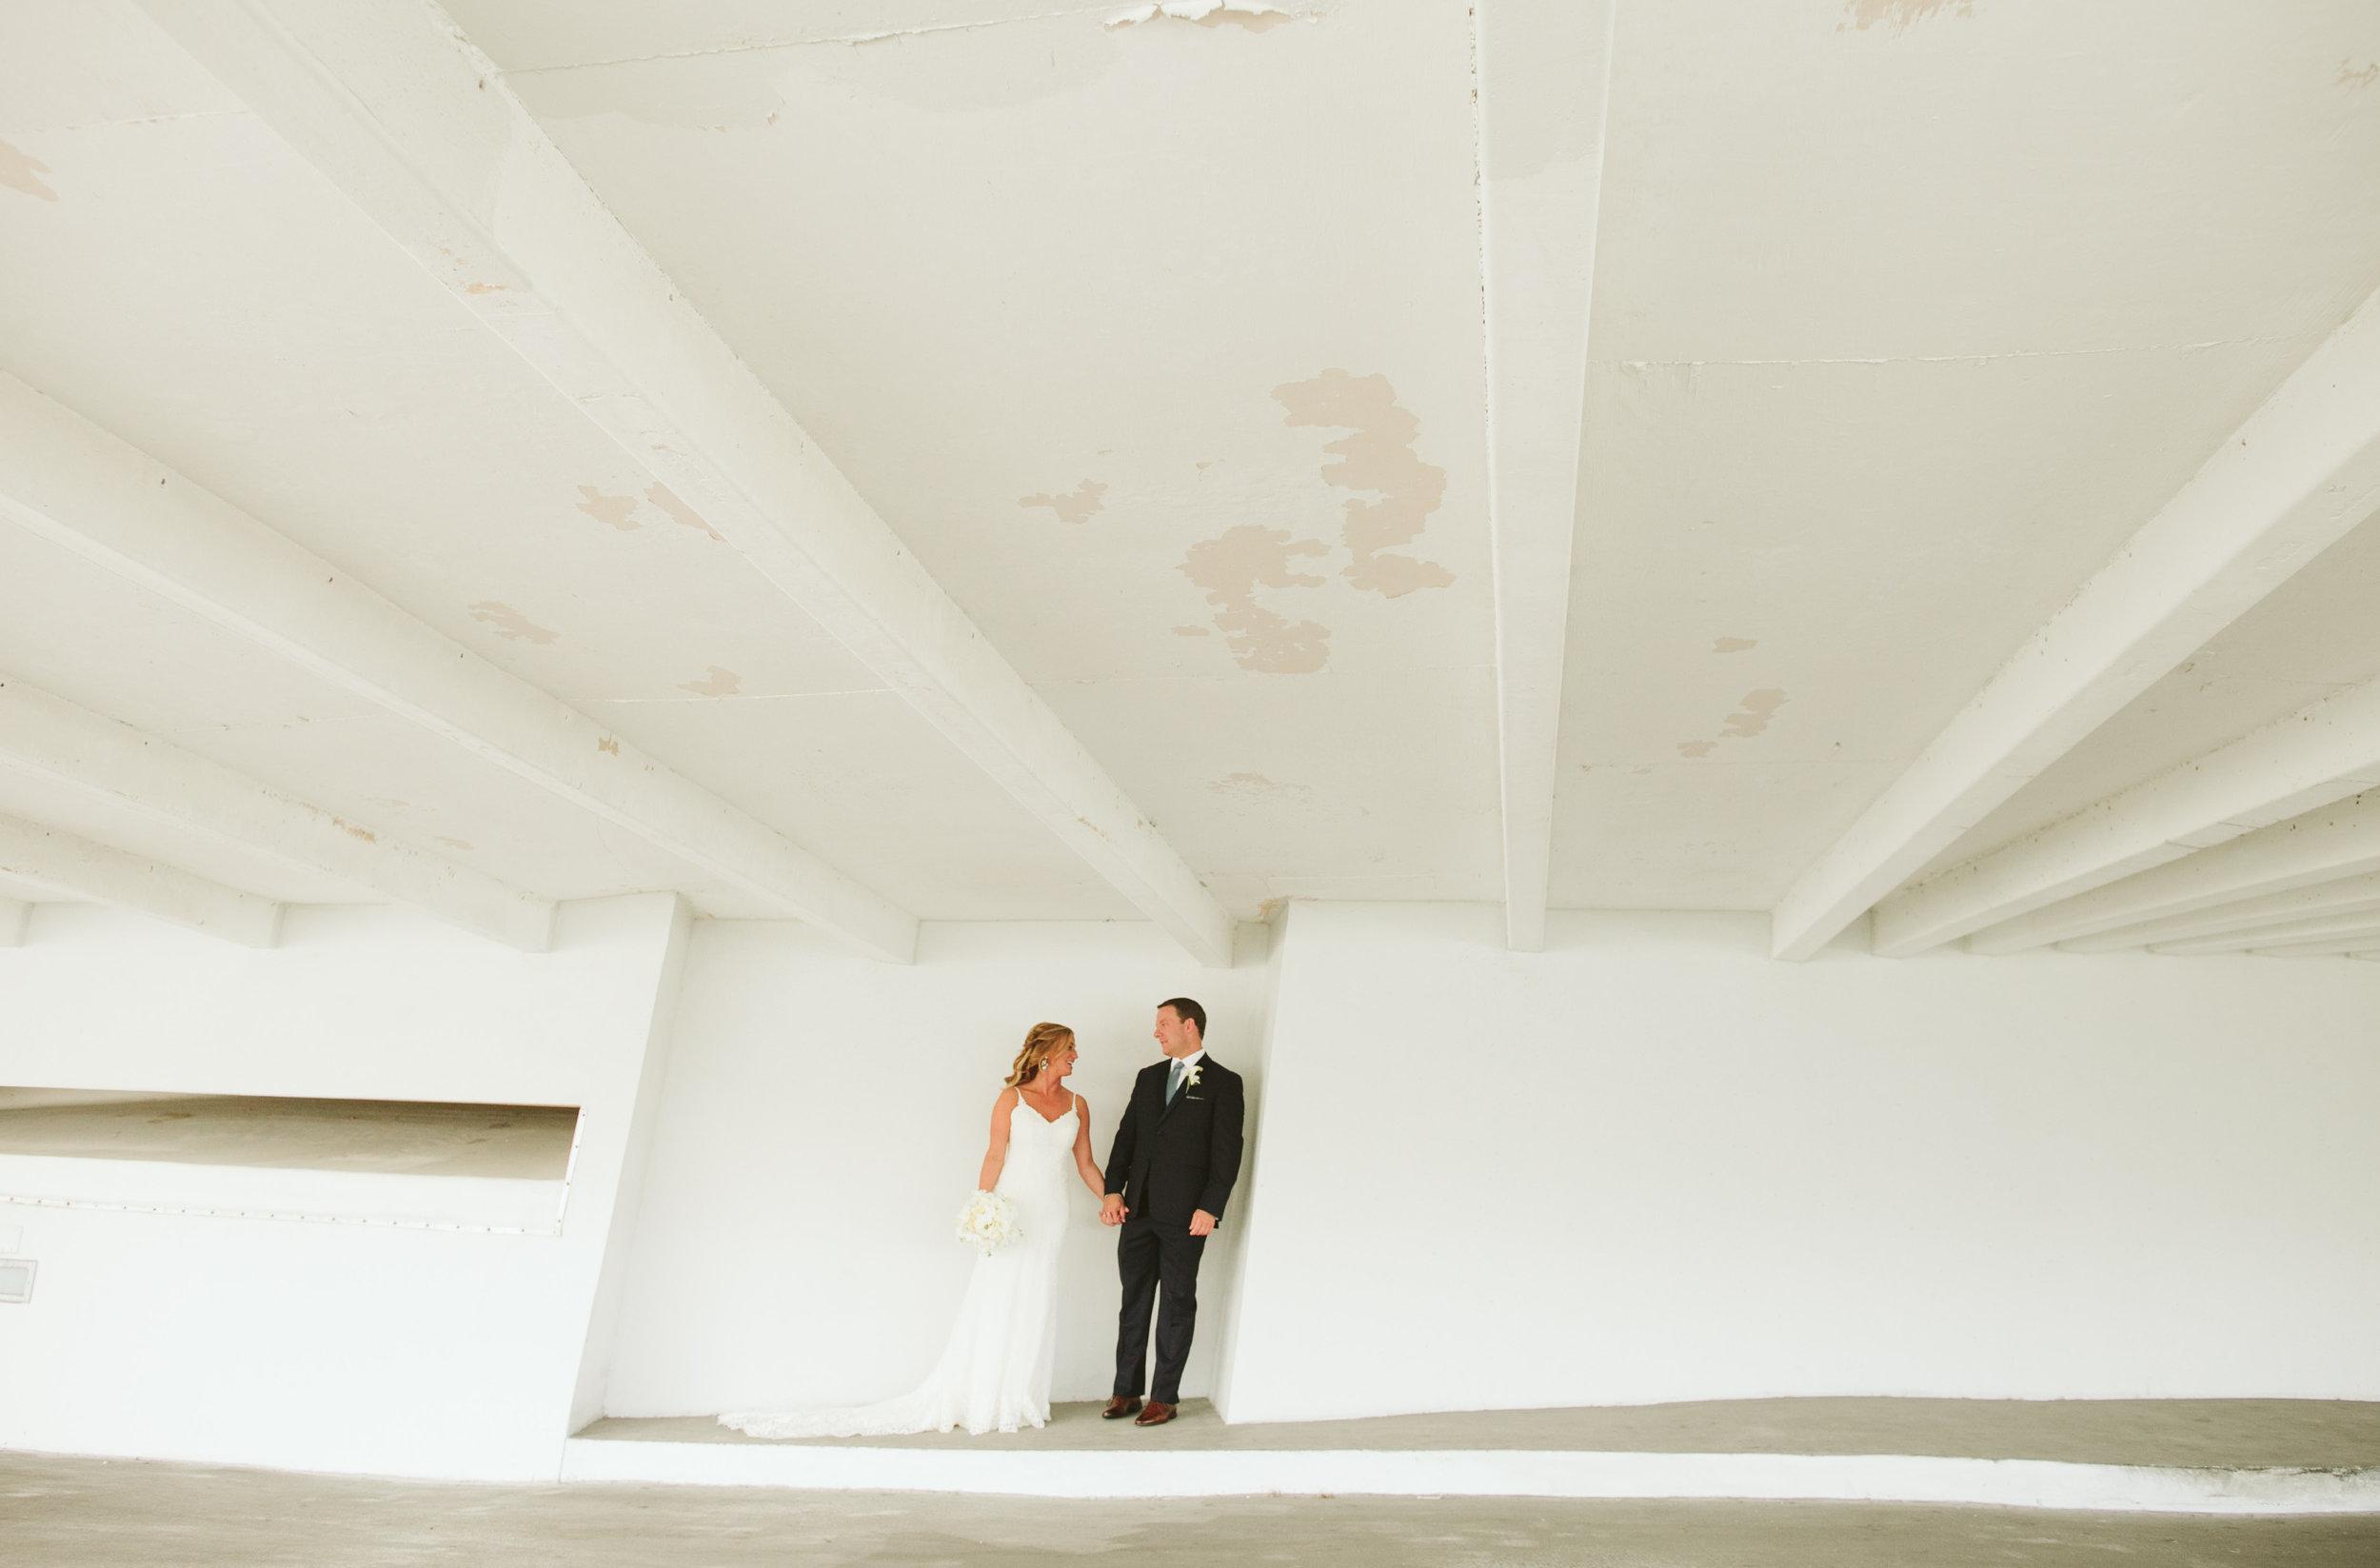 Kim + John's Wedding at the Waterstone Hotel in Boca Raton31.jpg